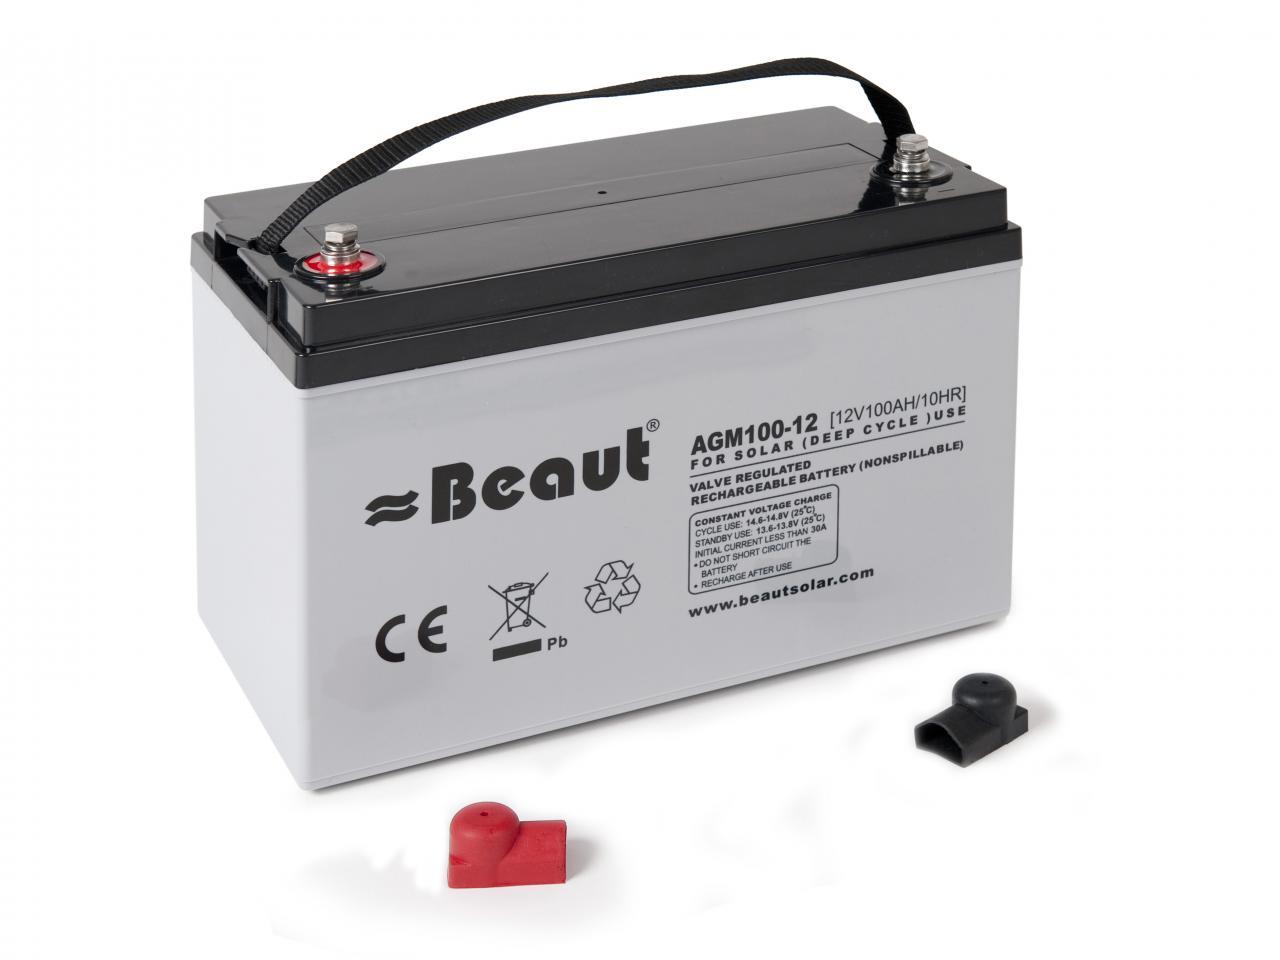 batteries beaut agm battery 100ah. Black Bedroom Furniture Sets. Home Design Ideas